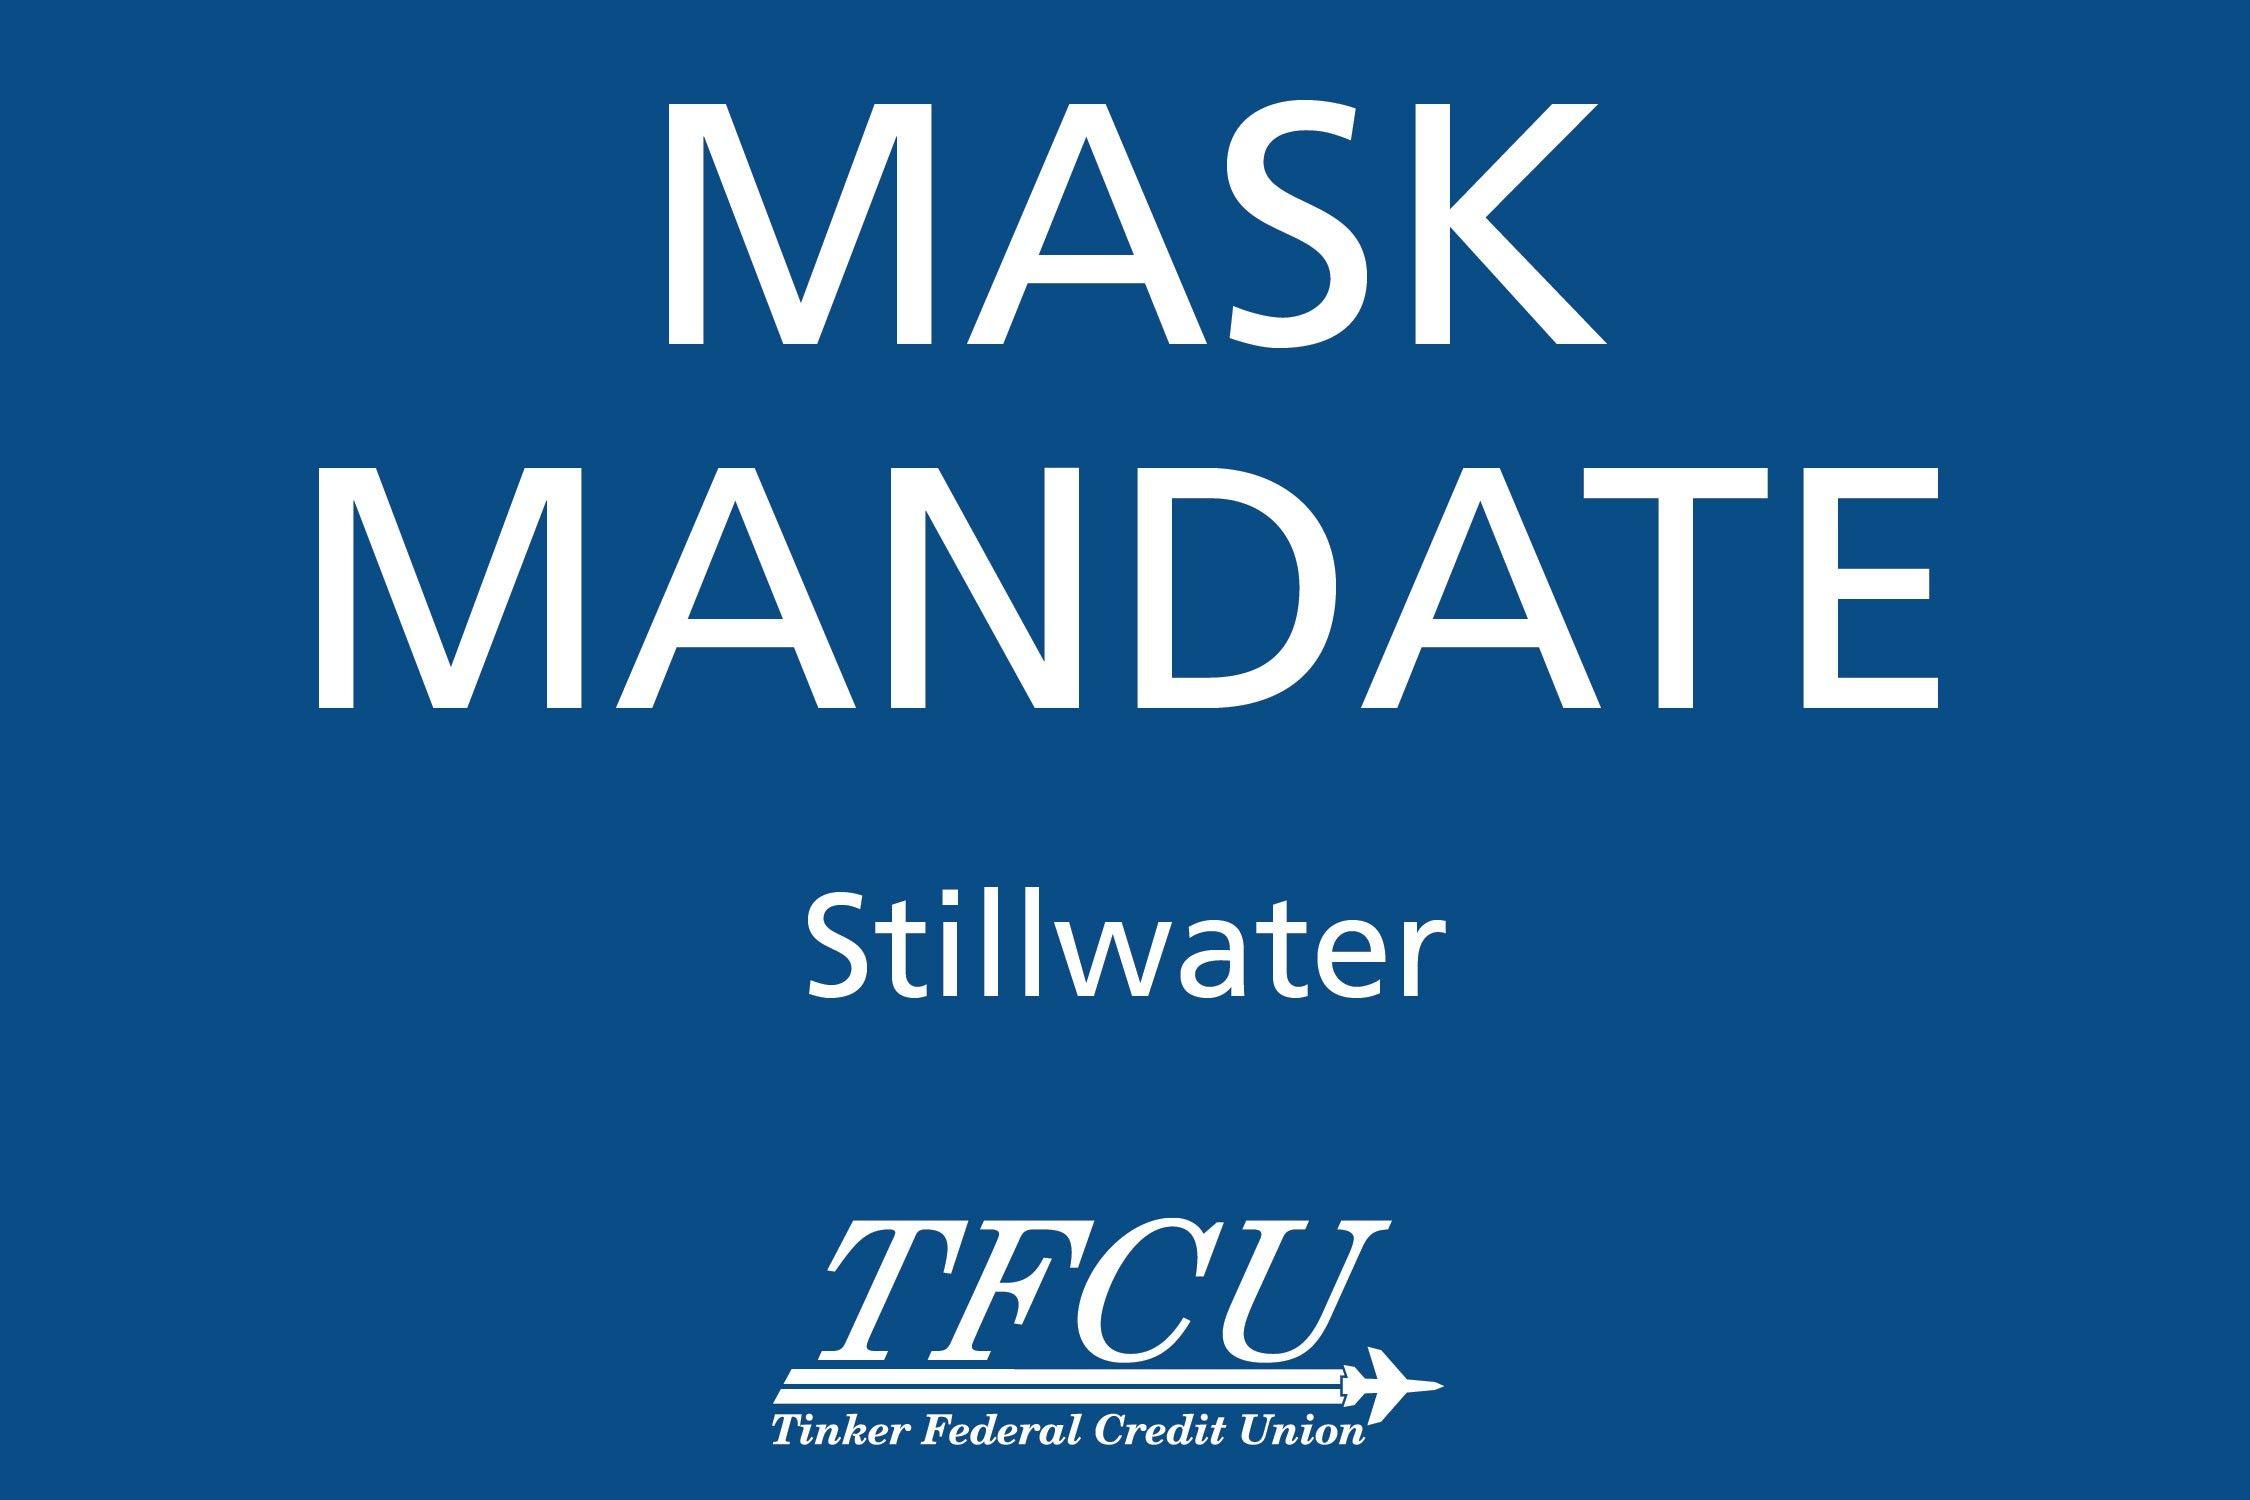 Stillwater Mask Mandate